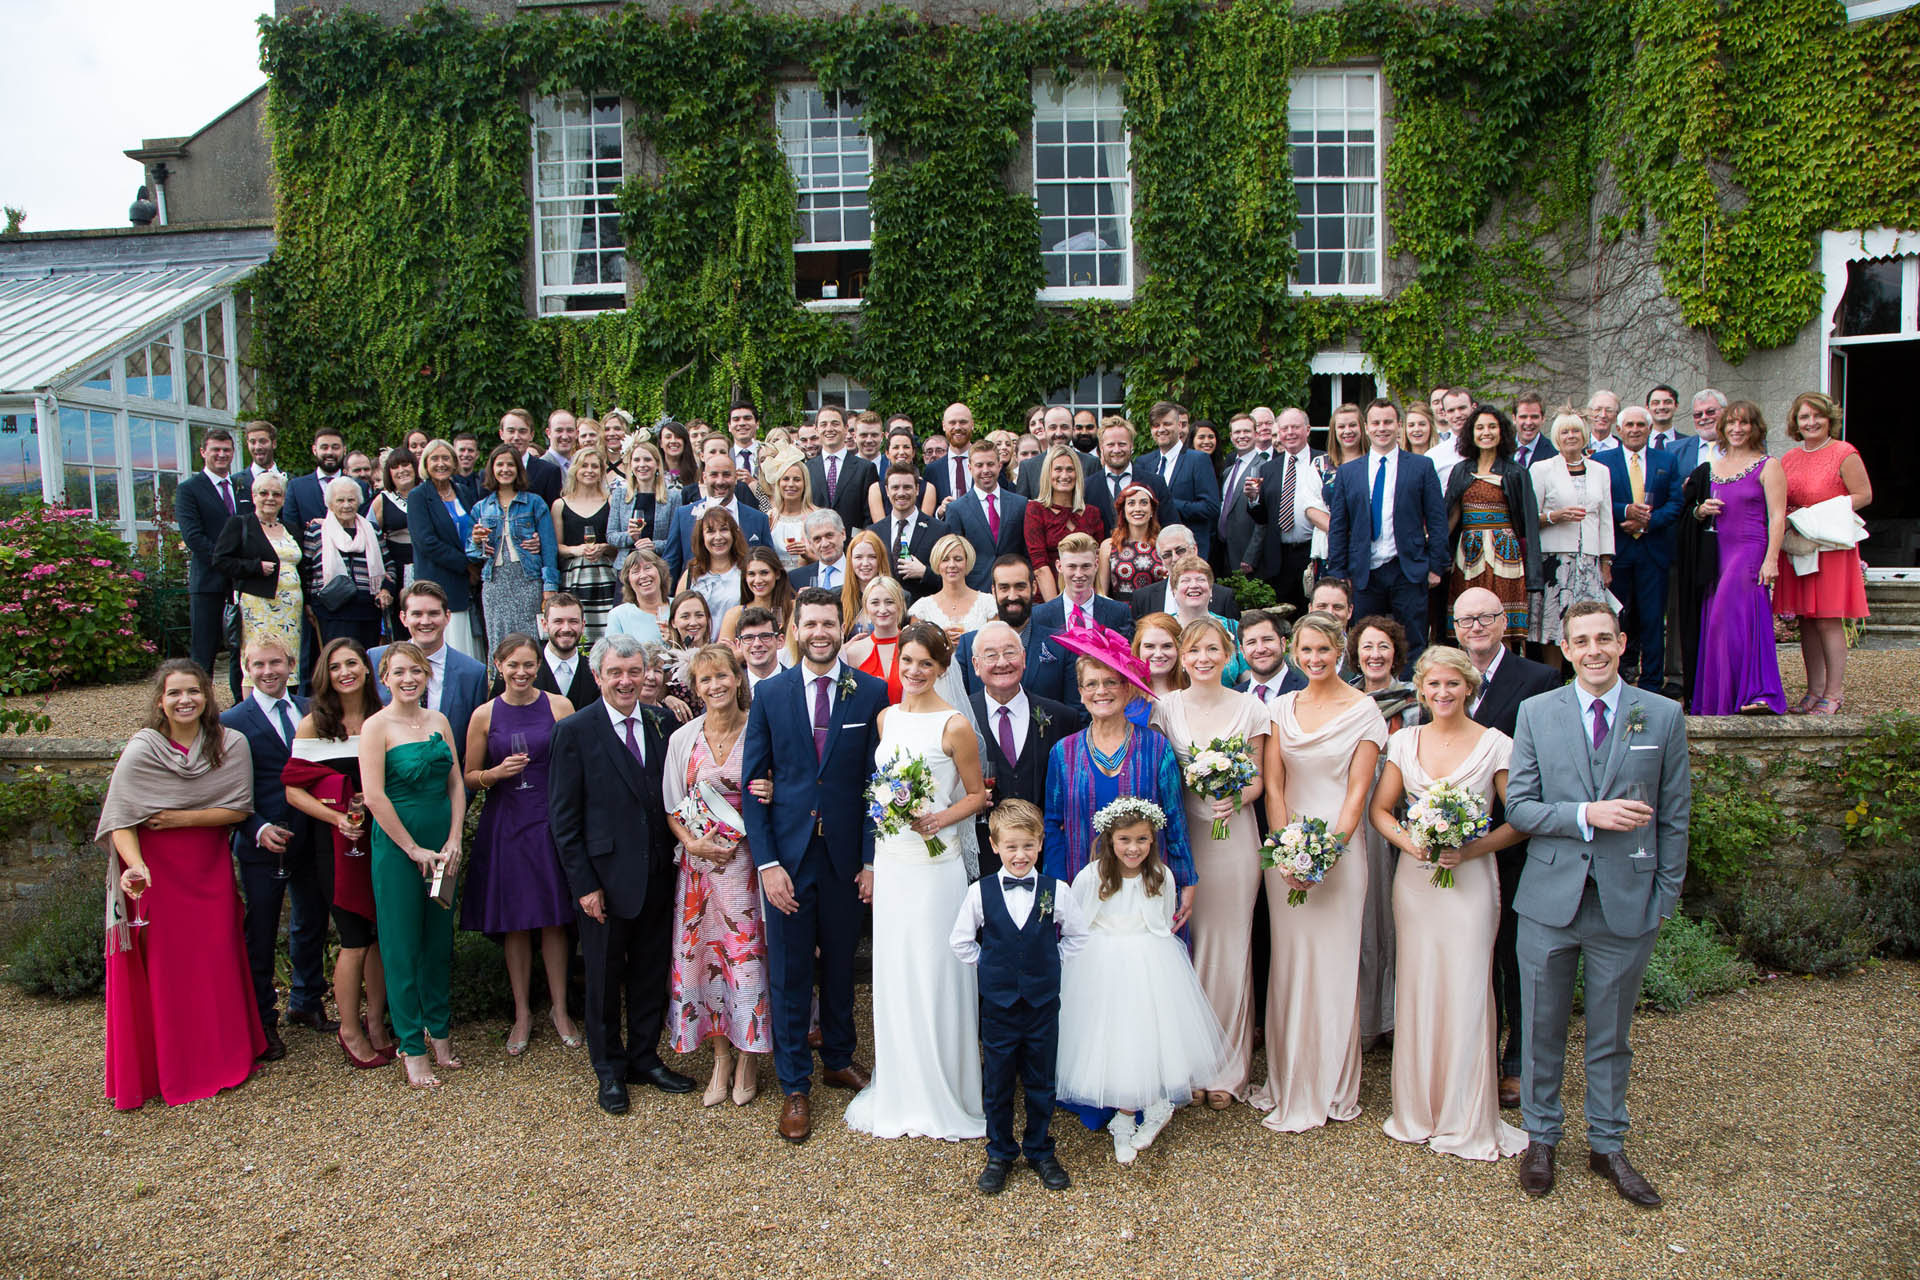 pennard-house-wedding-32